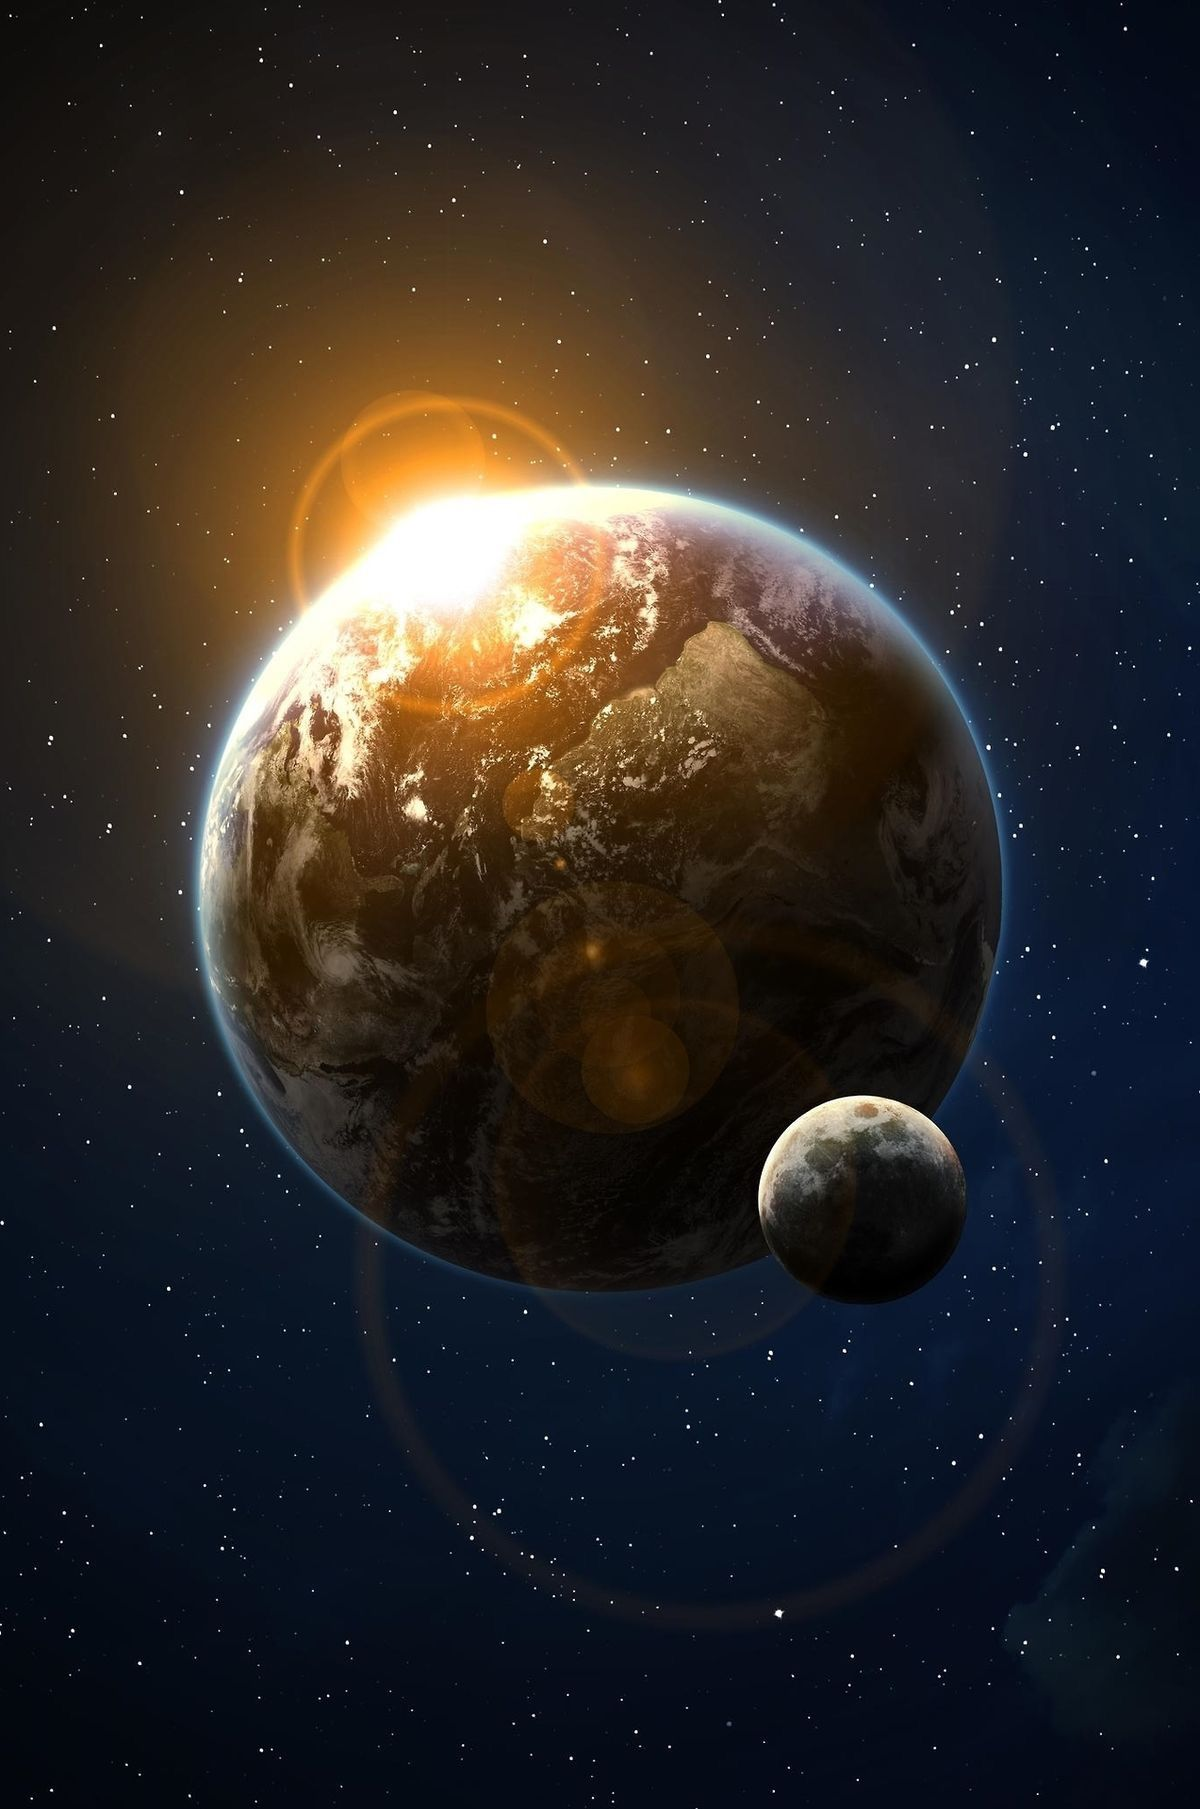 Pin En صورة تحدد المراكز المتاينة والتى تدور حولها الكواكب ويكون مركزها الشمس او الدائرة البؤرية فيها